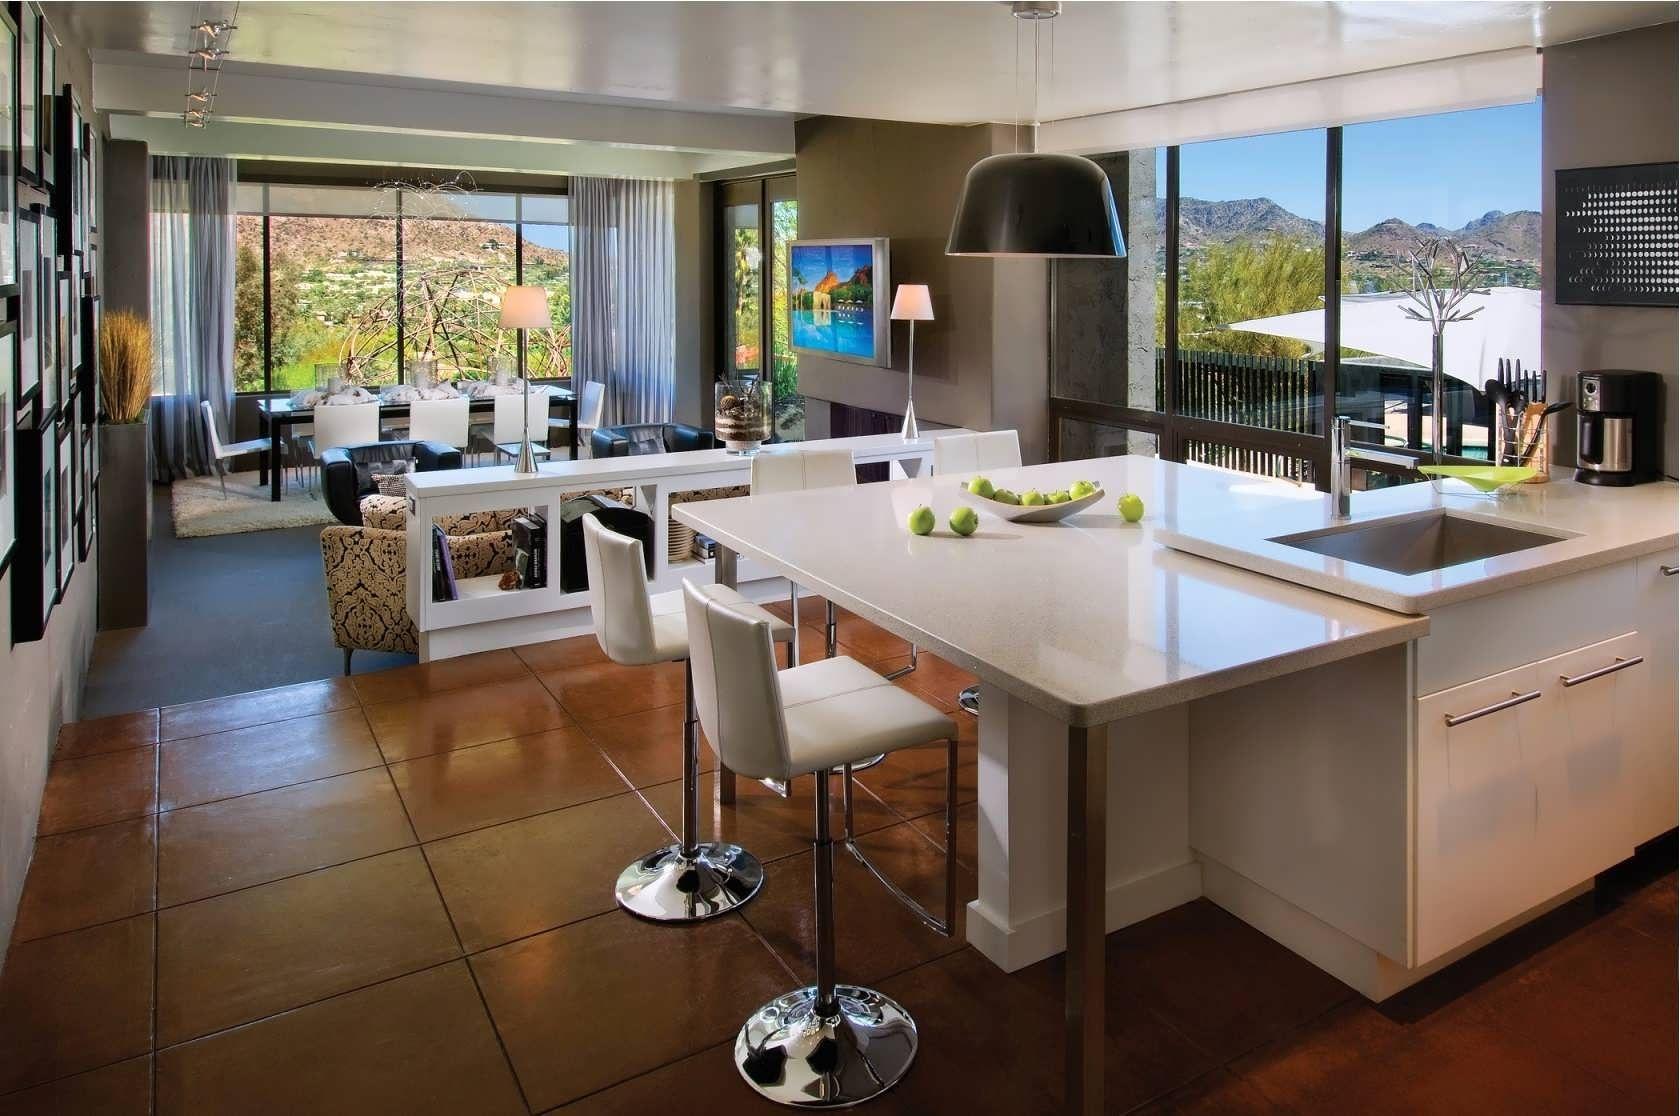 Podobny Obraz  Best Open Plan Interiors Designs  Pinterest Amazing Design My Kitchen Layout Decorating Inspiration